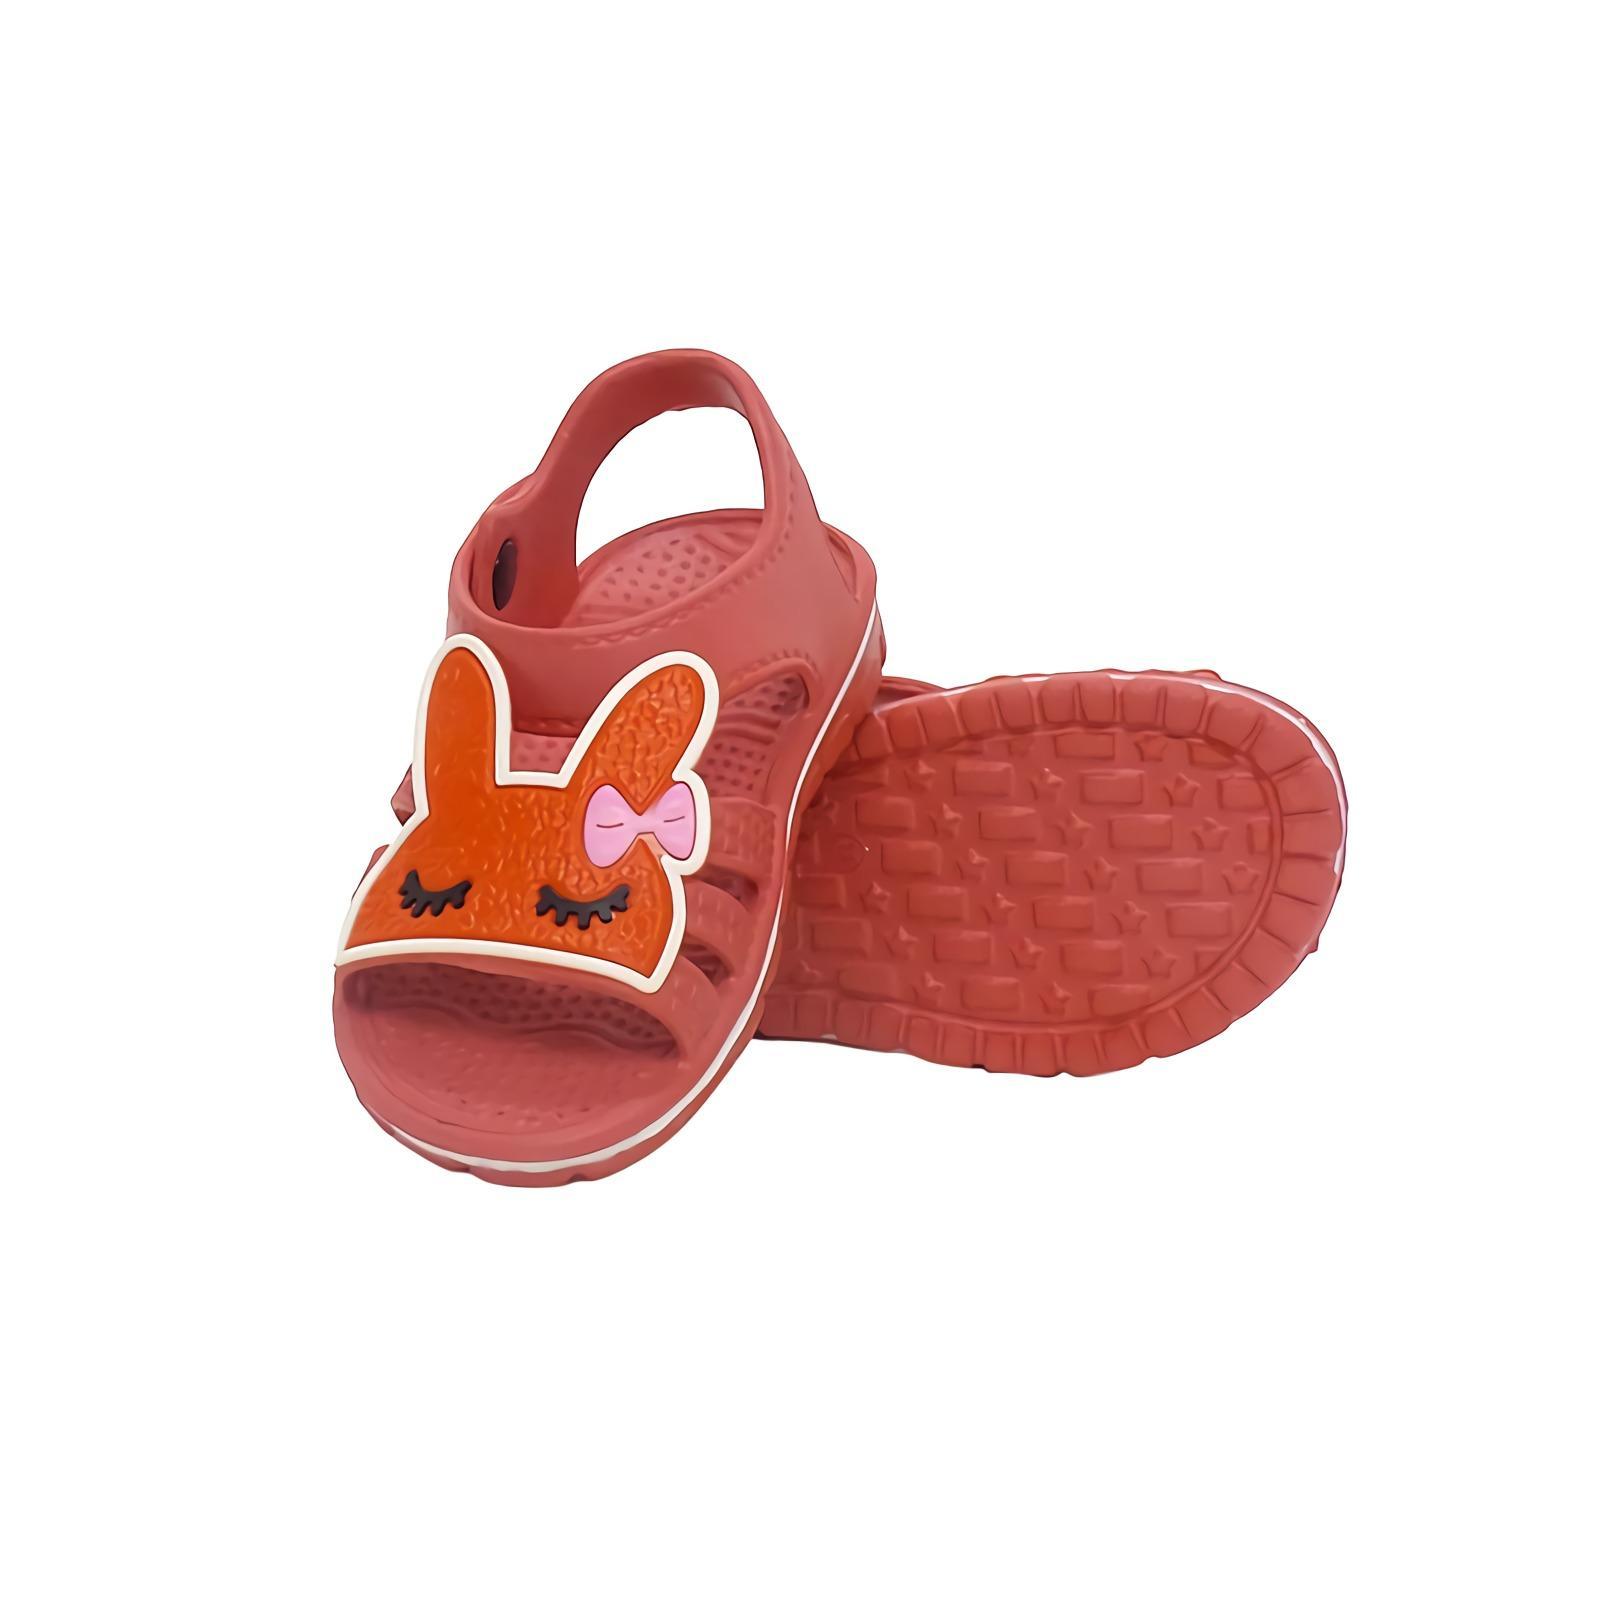 DULUX Sepatu Sandal Anak [24-29] RE-155D Kids Flat Shoes Merah